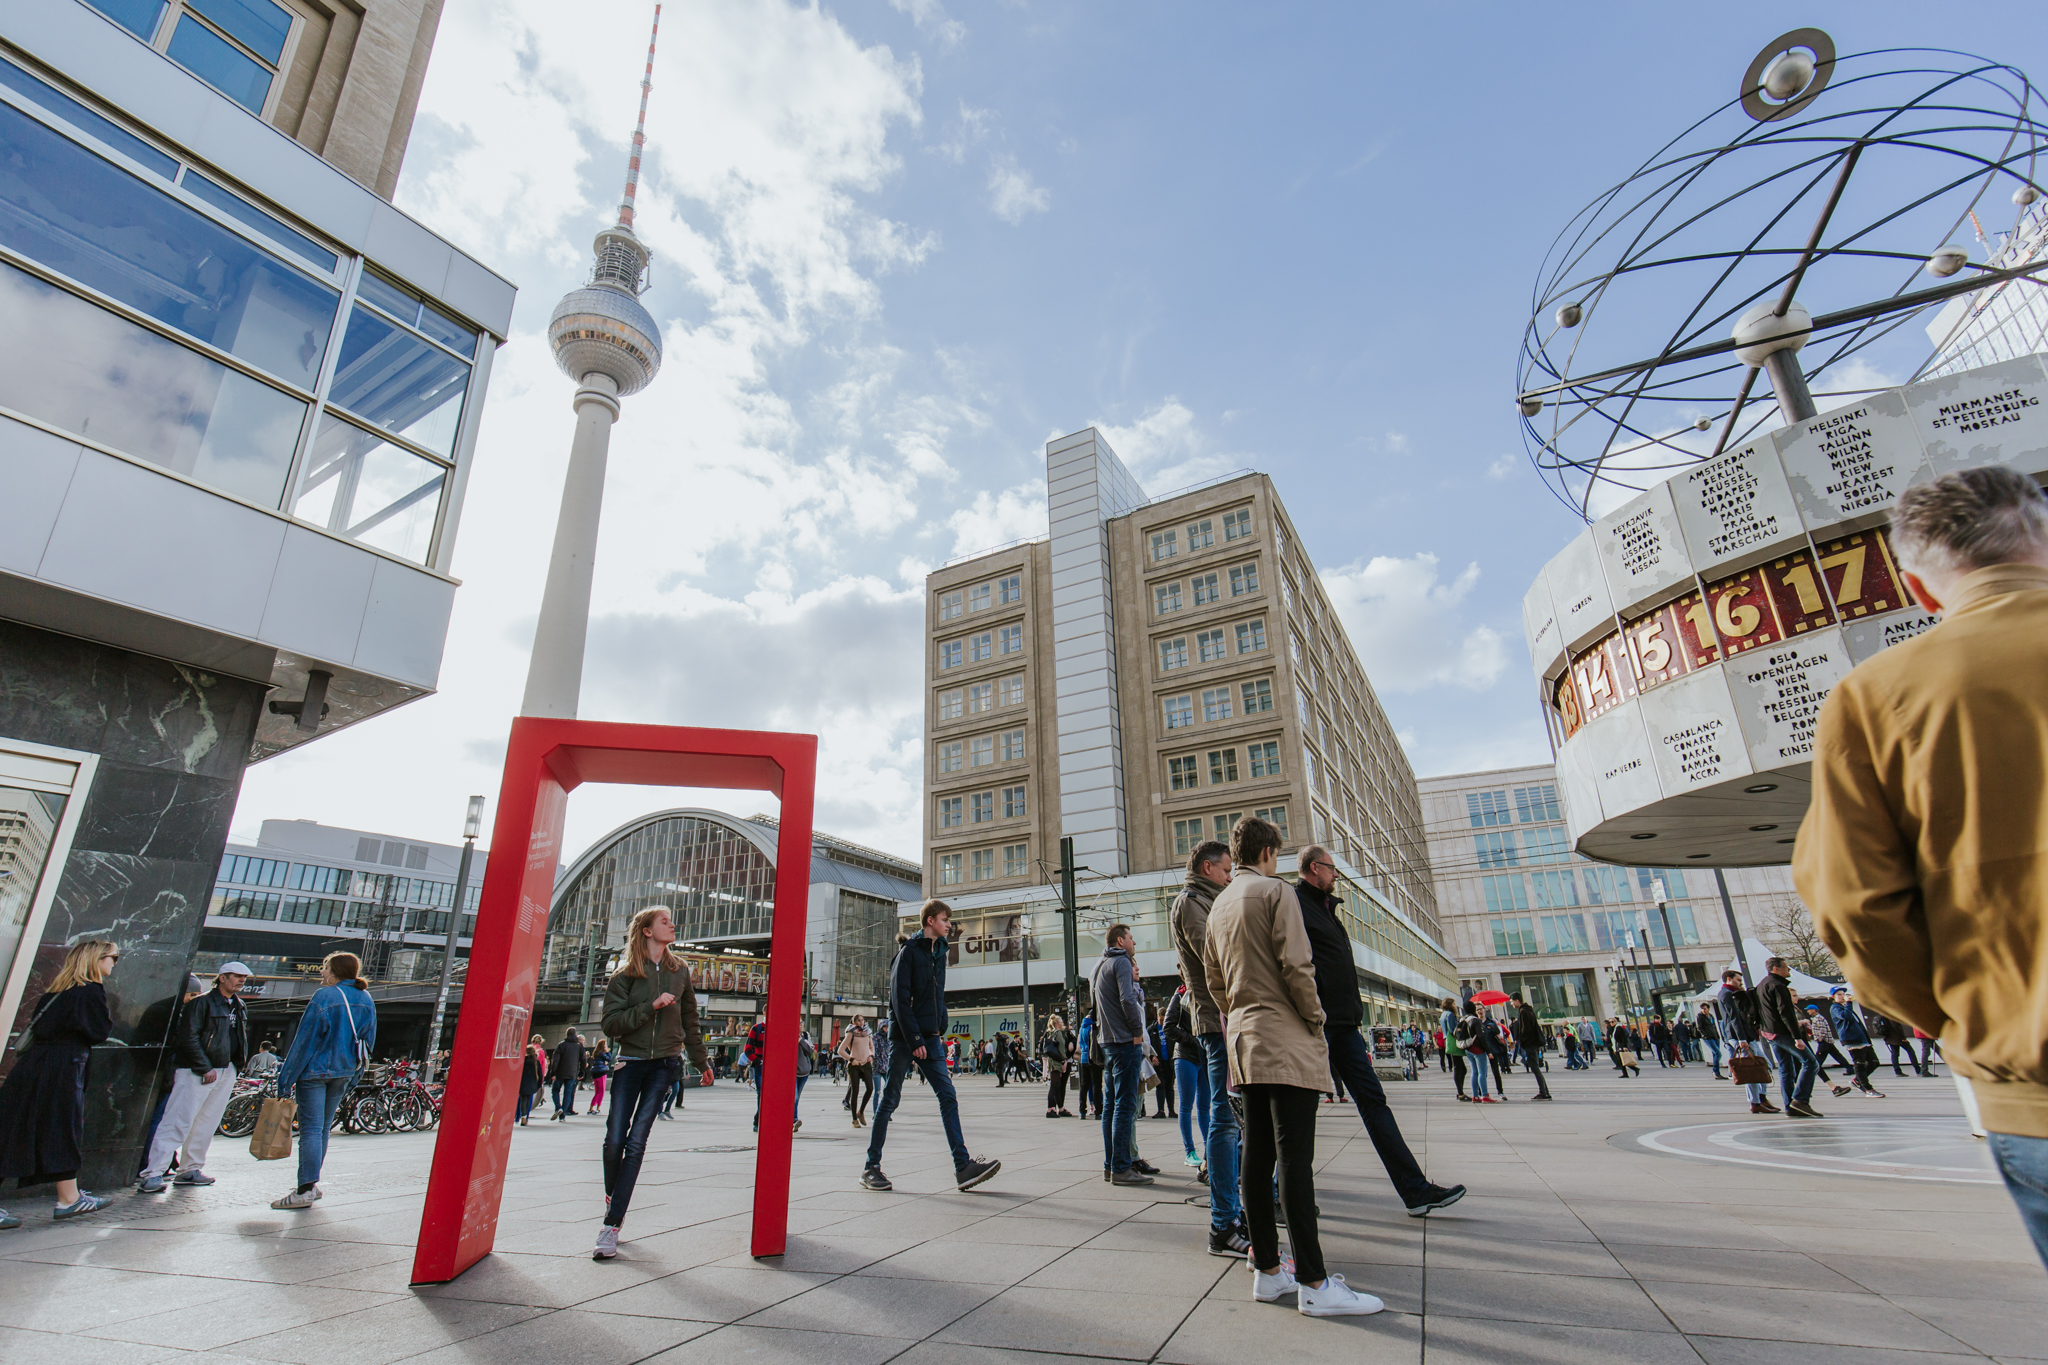 Photos by Christian Kielmann Copyright of the Berlin Culture Project https://paradiese.berlin/en/press